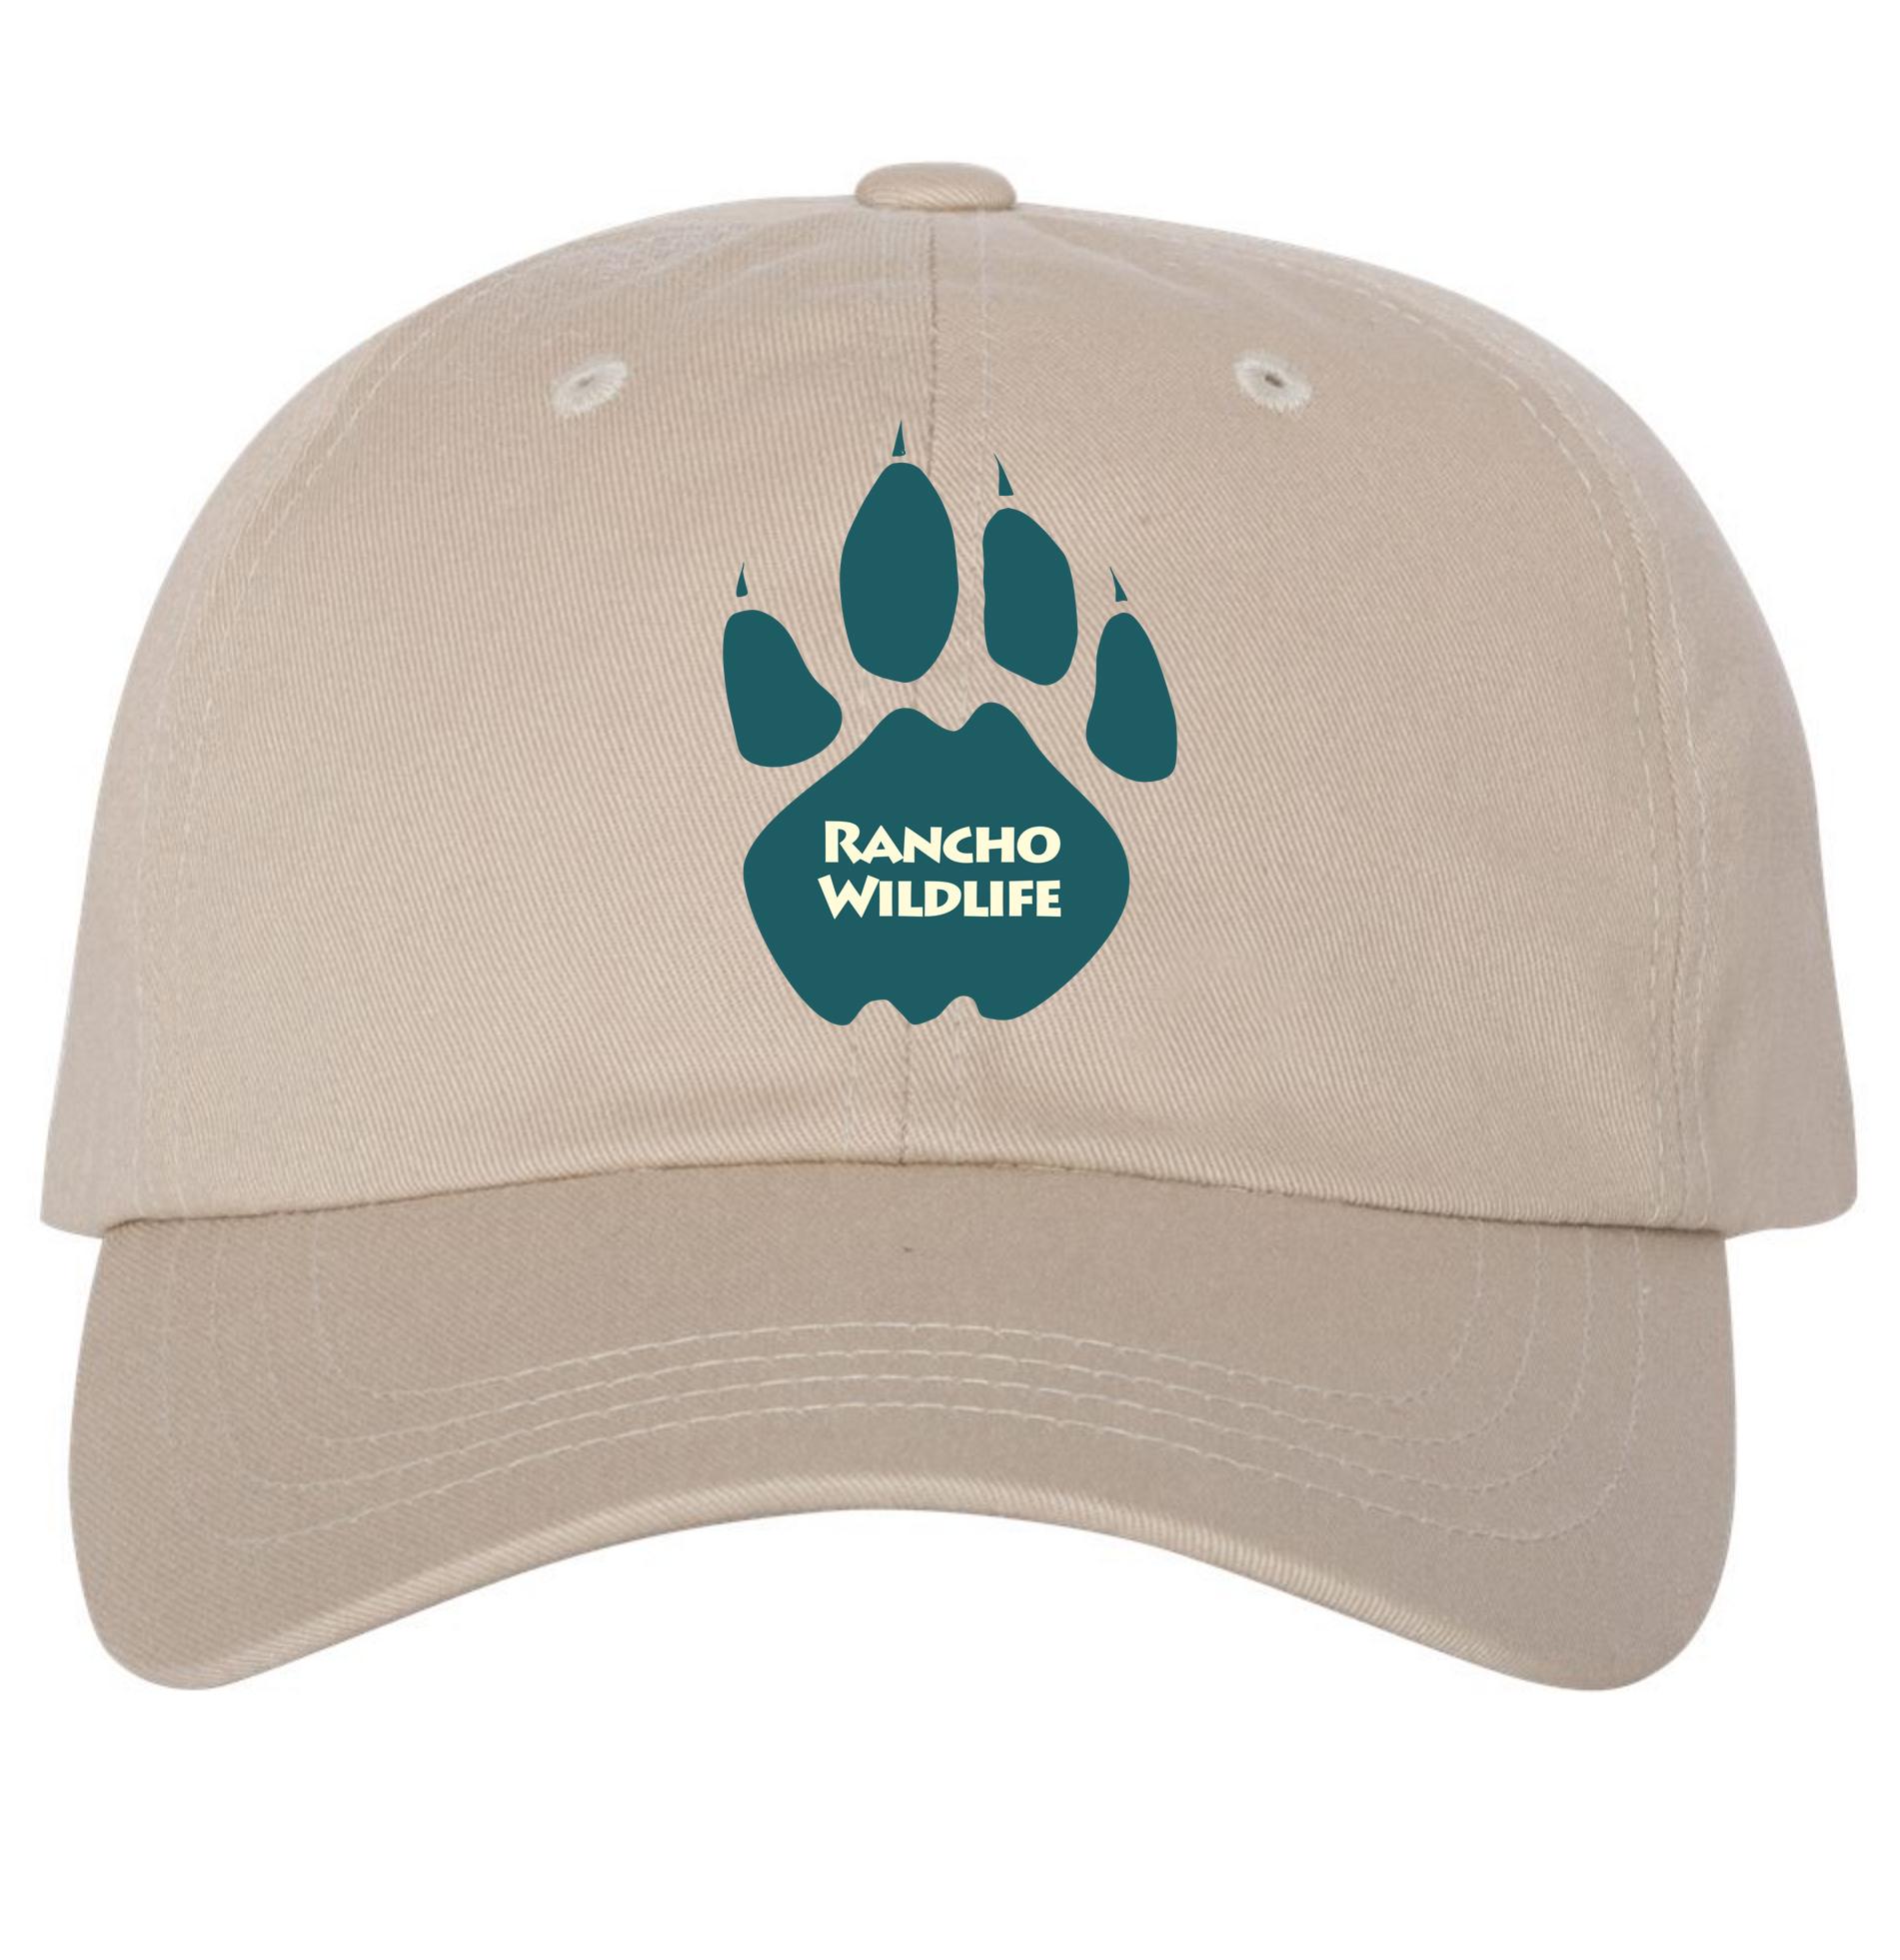 249e418d89e RANCHO WILDLIFE STONE DAD HAT - Merchwide Inc